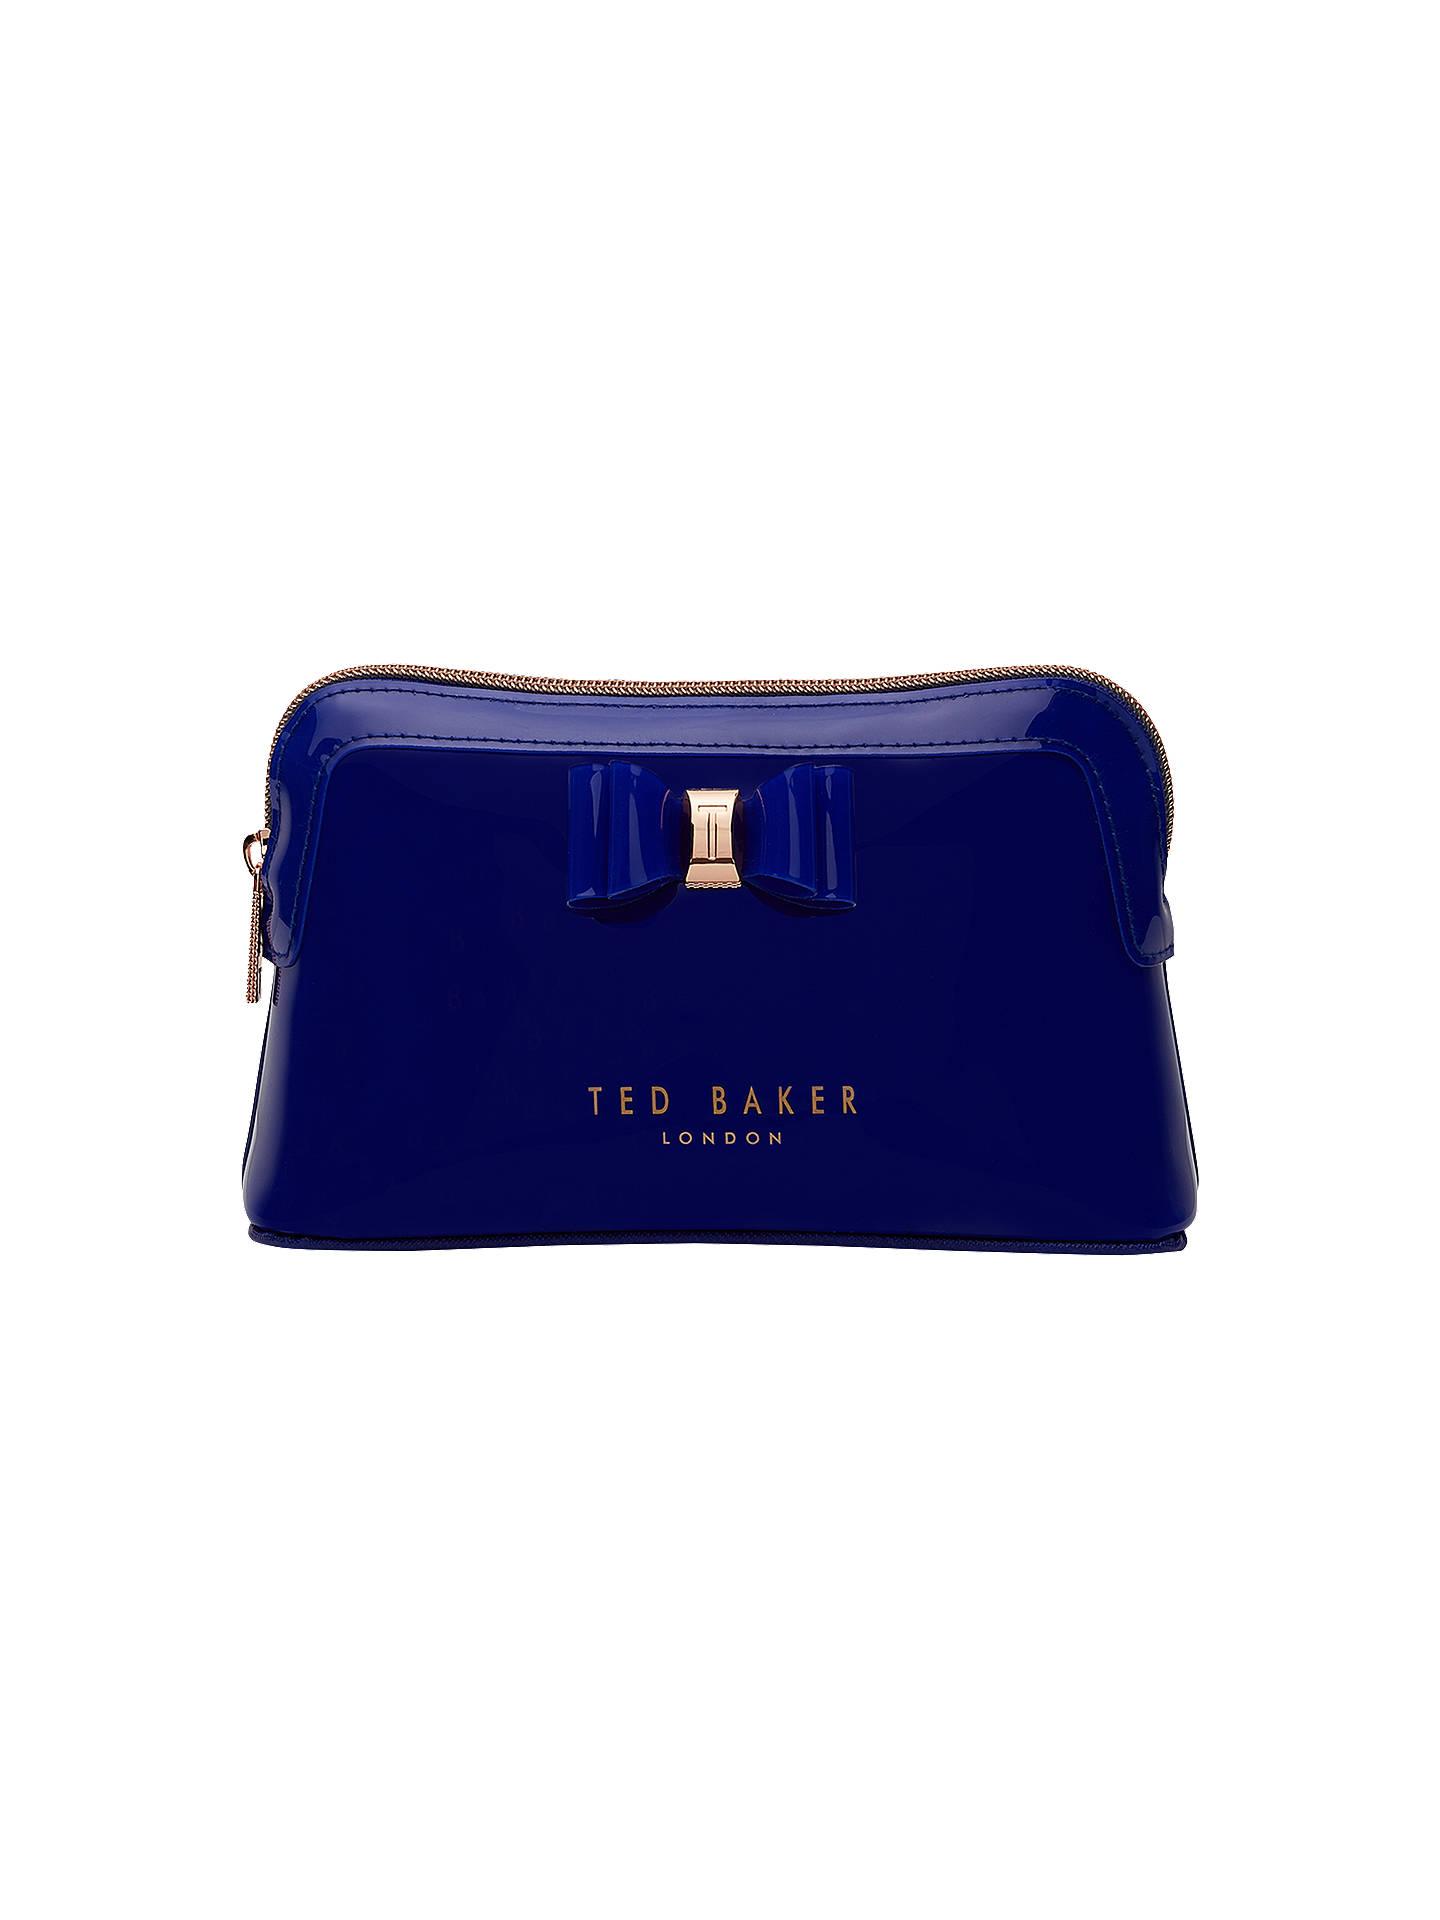 faa72296e7a Buy Ted Baker Julis Bow Makeup Bag, Bright Blue Online at johnlewis.com ...